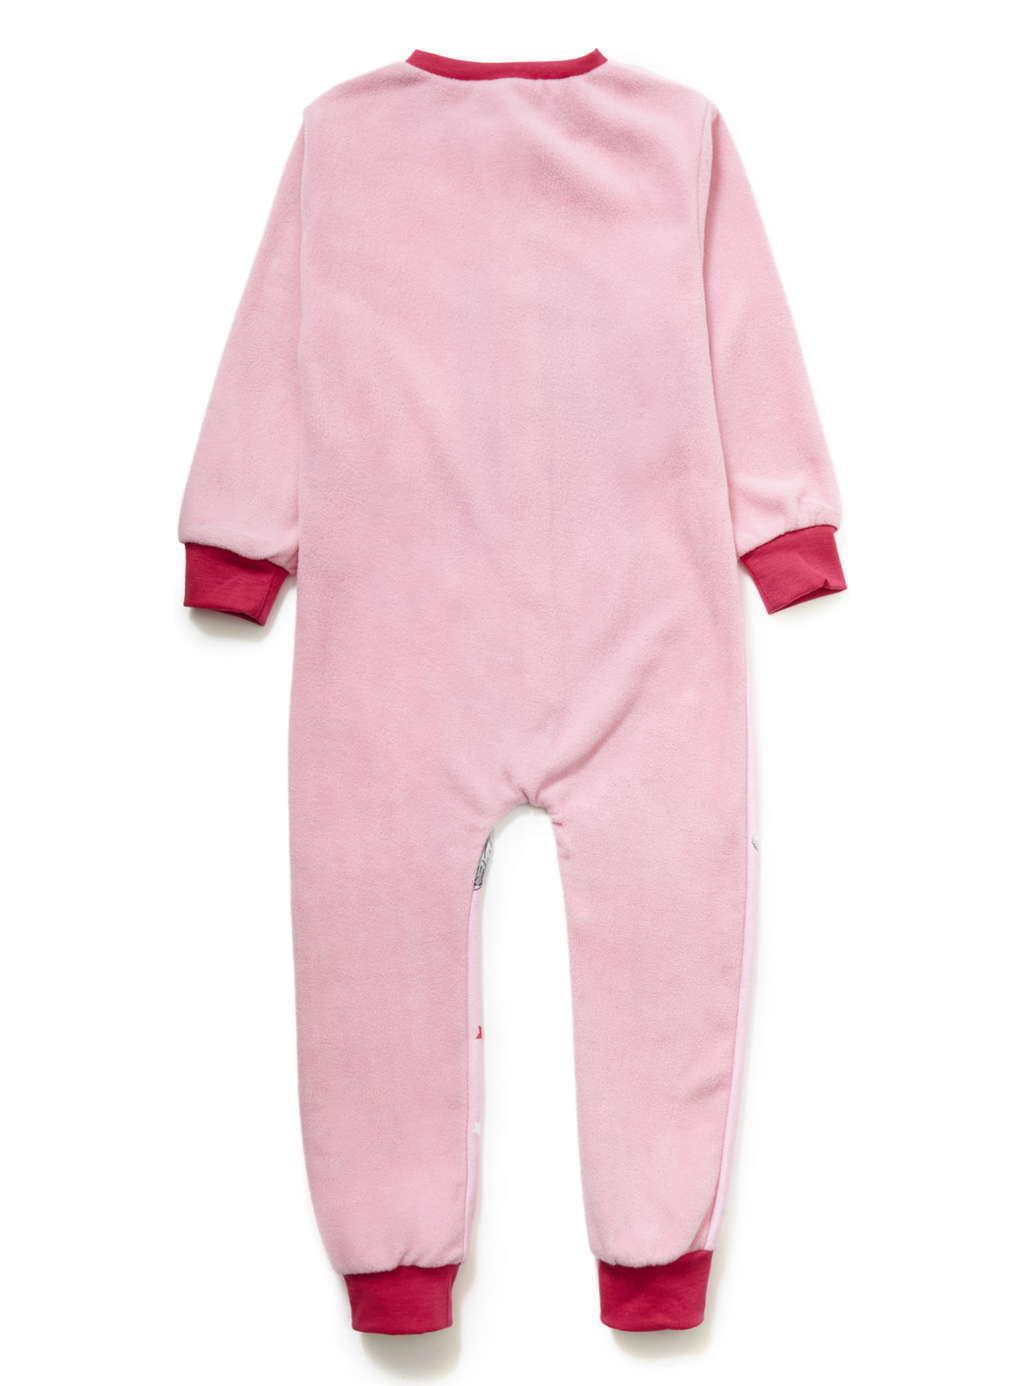 Girls Me To You Tatty Teddy Sleepsuit 7-8 Jumpsuit